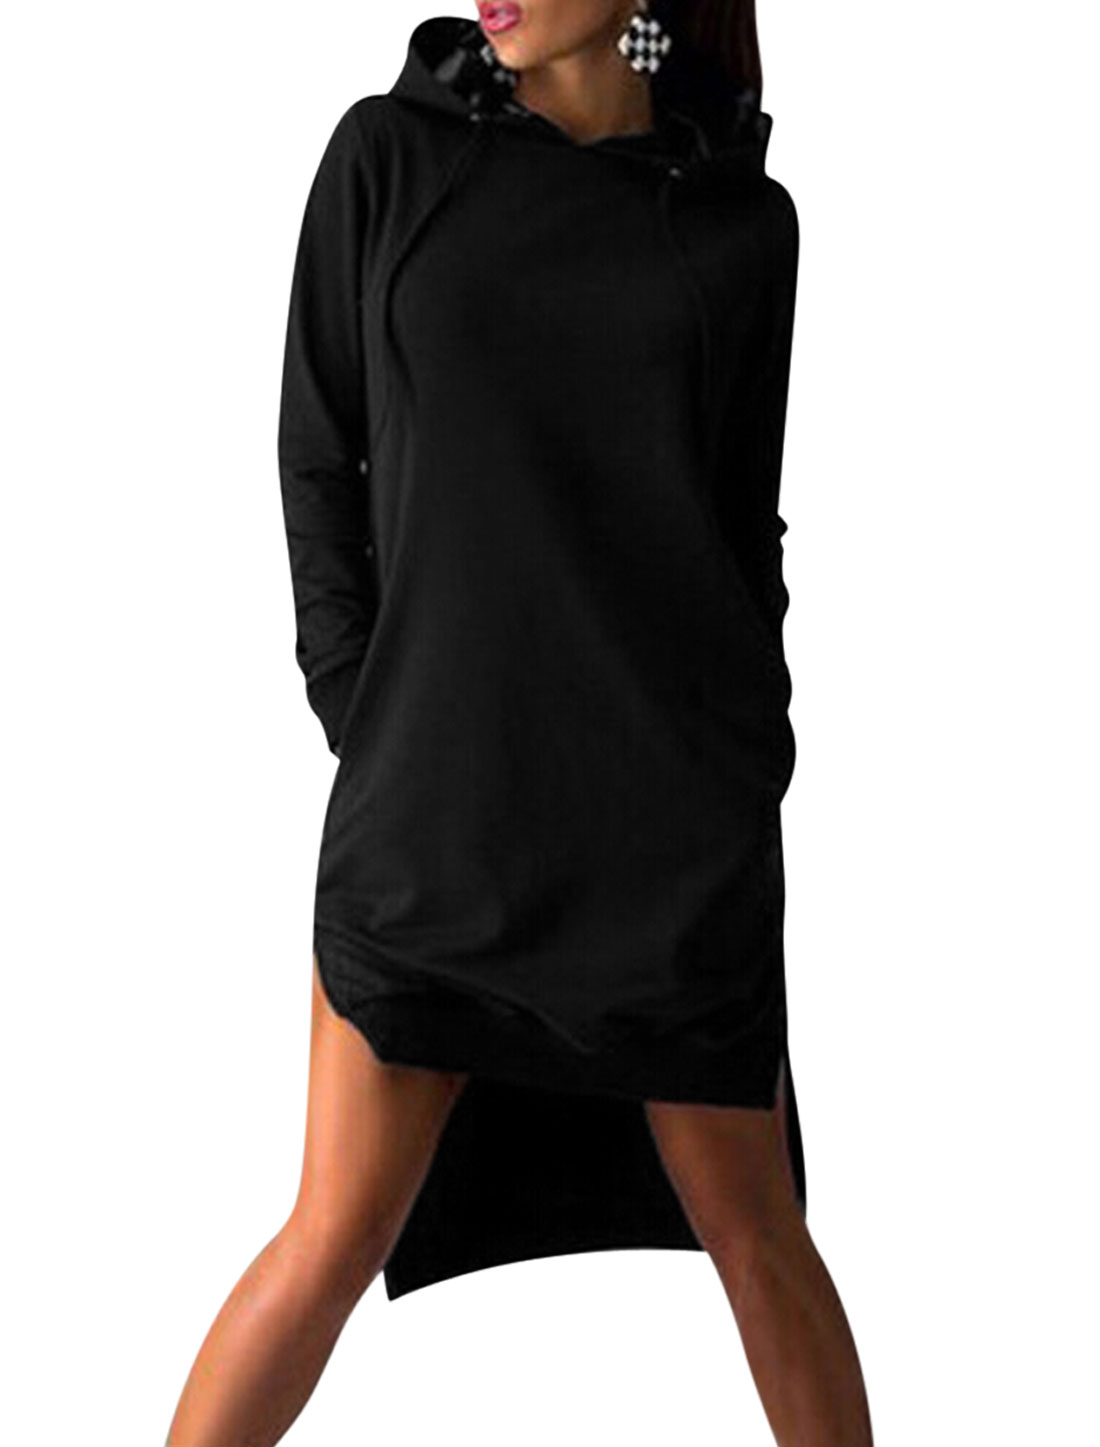 Woman Hooded Split Sides Soft Lined Tunic Sweatshirt Black XS